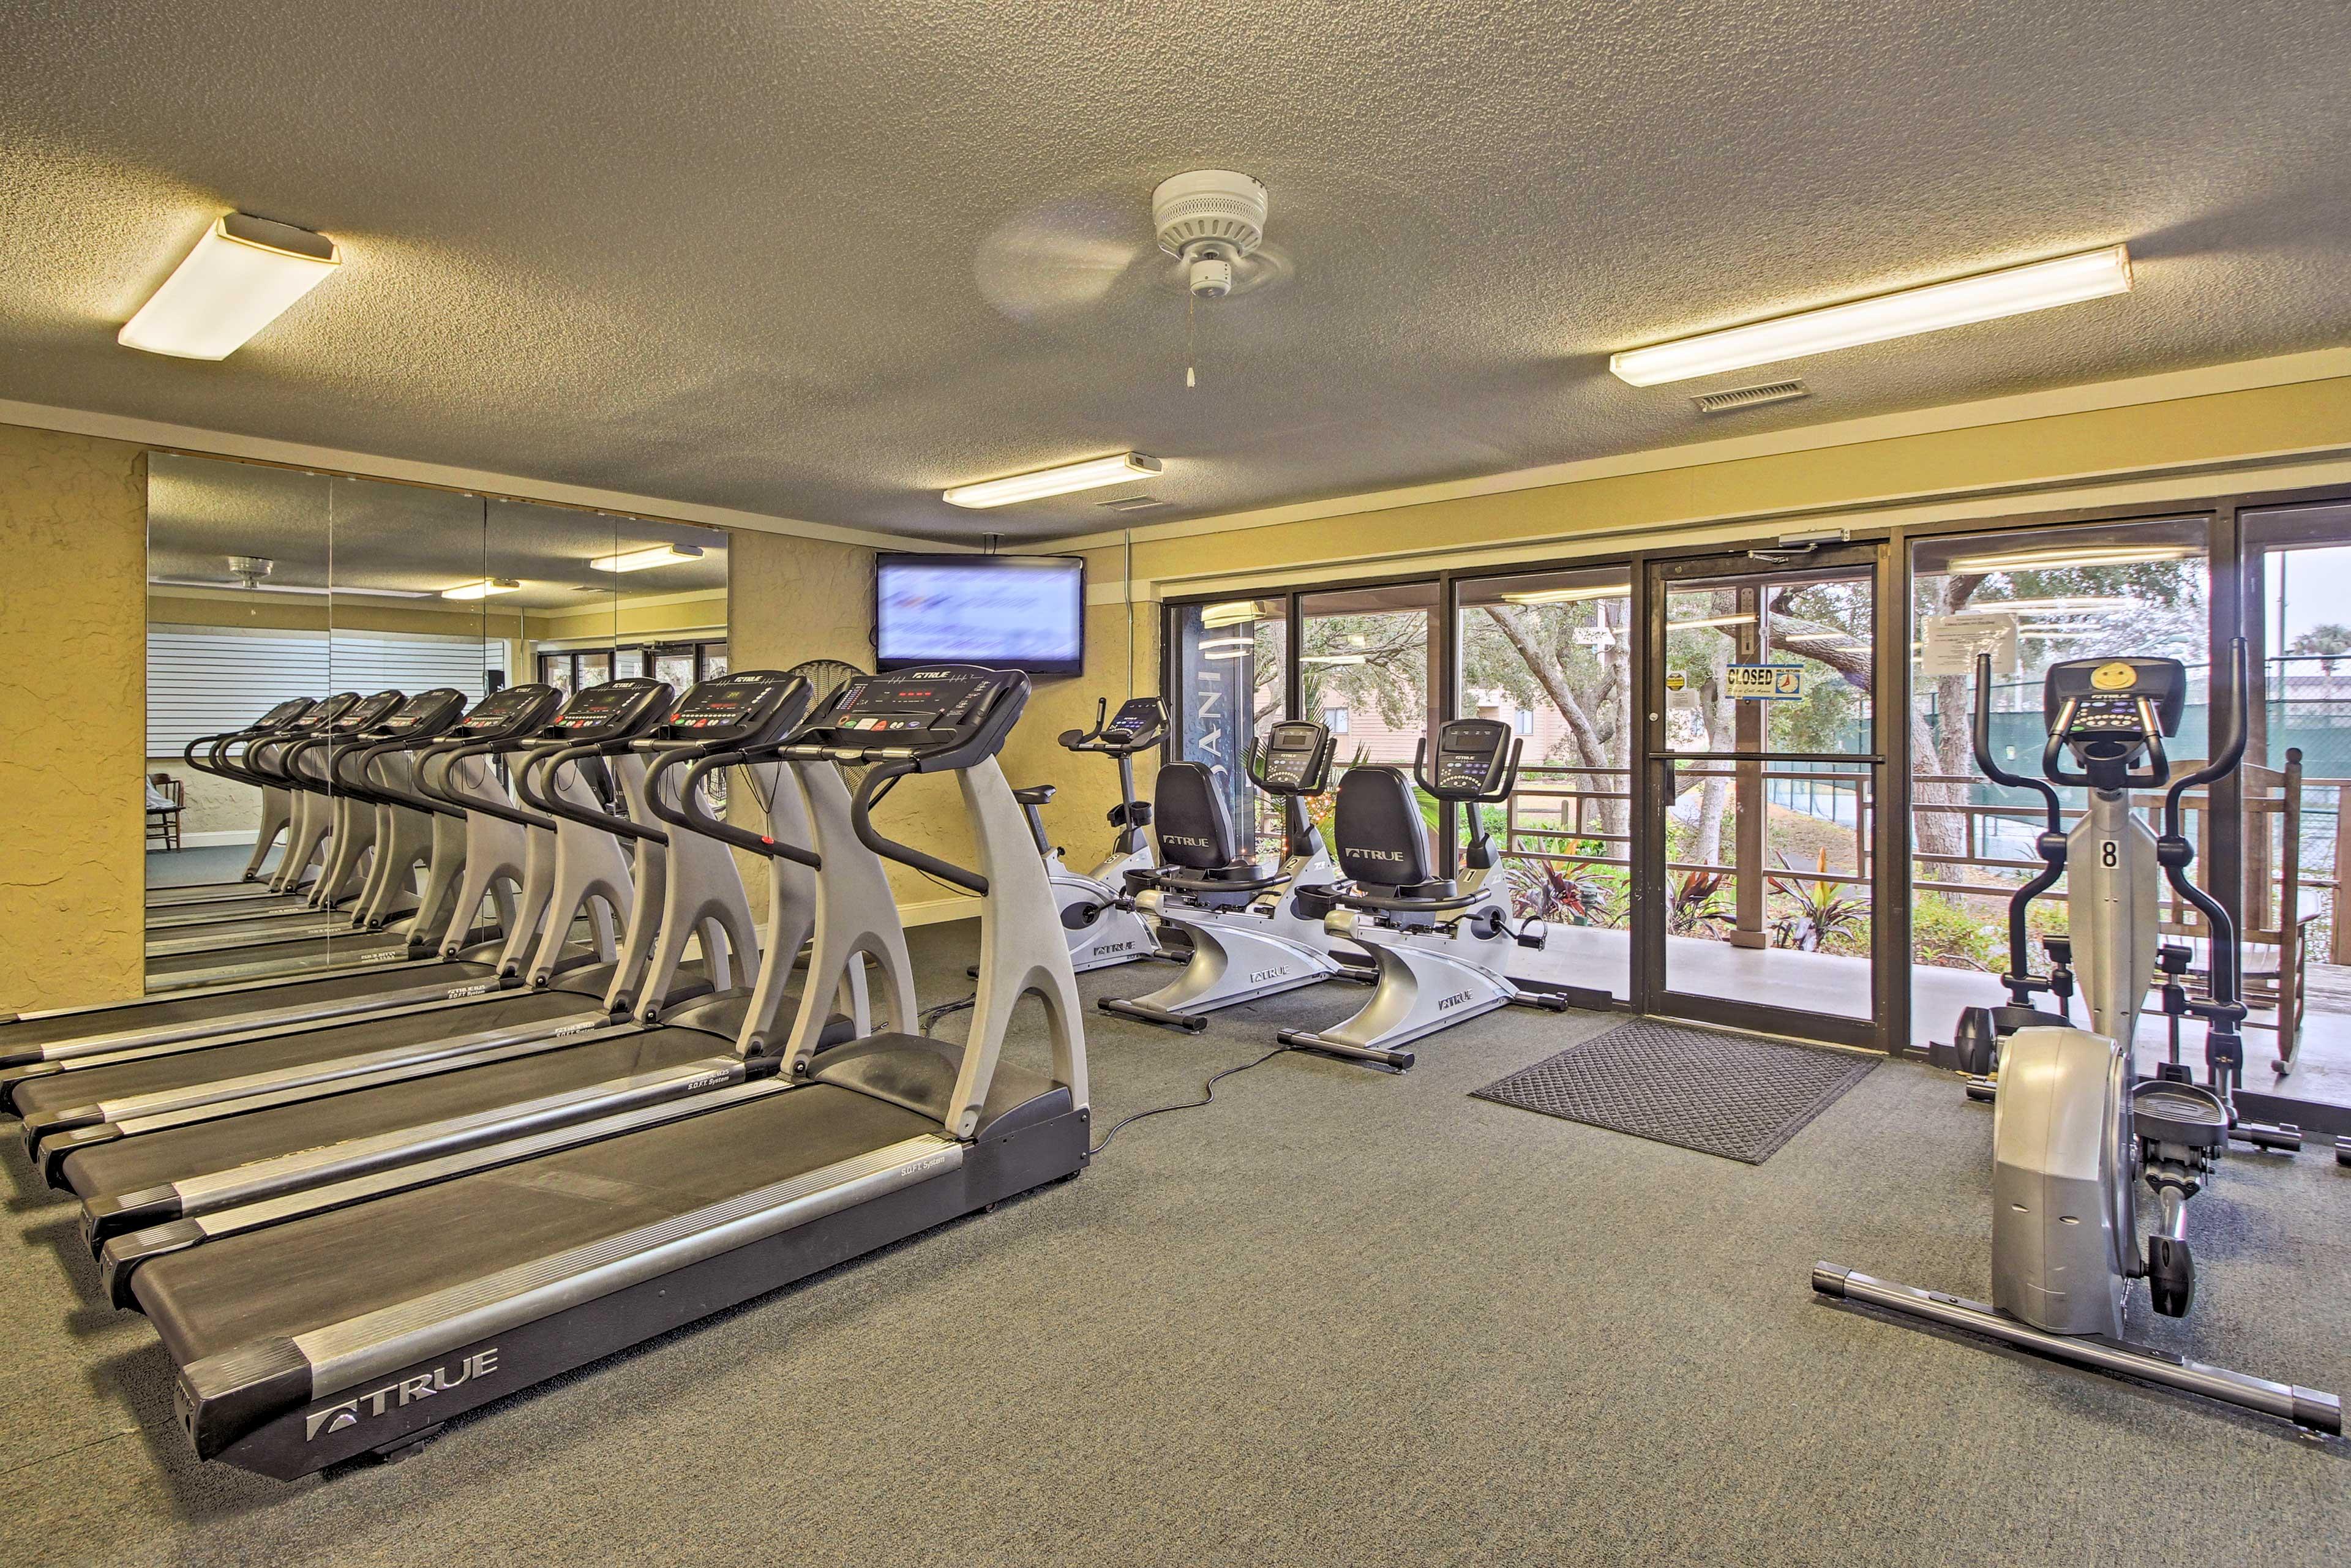 Break a sweat in the fitness center.